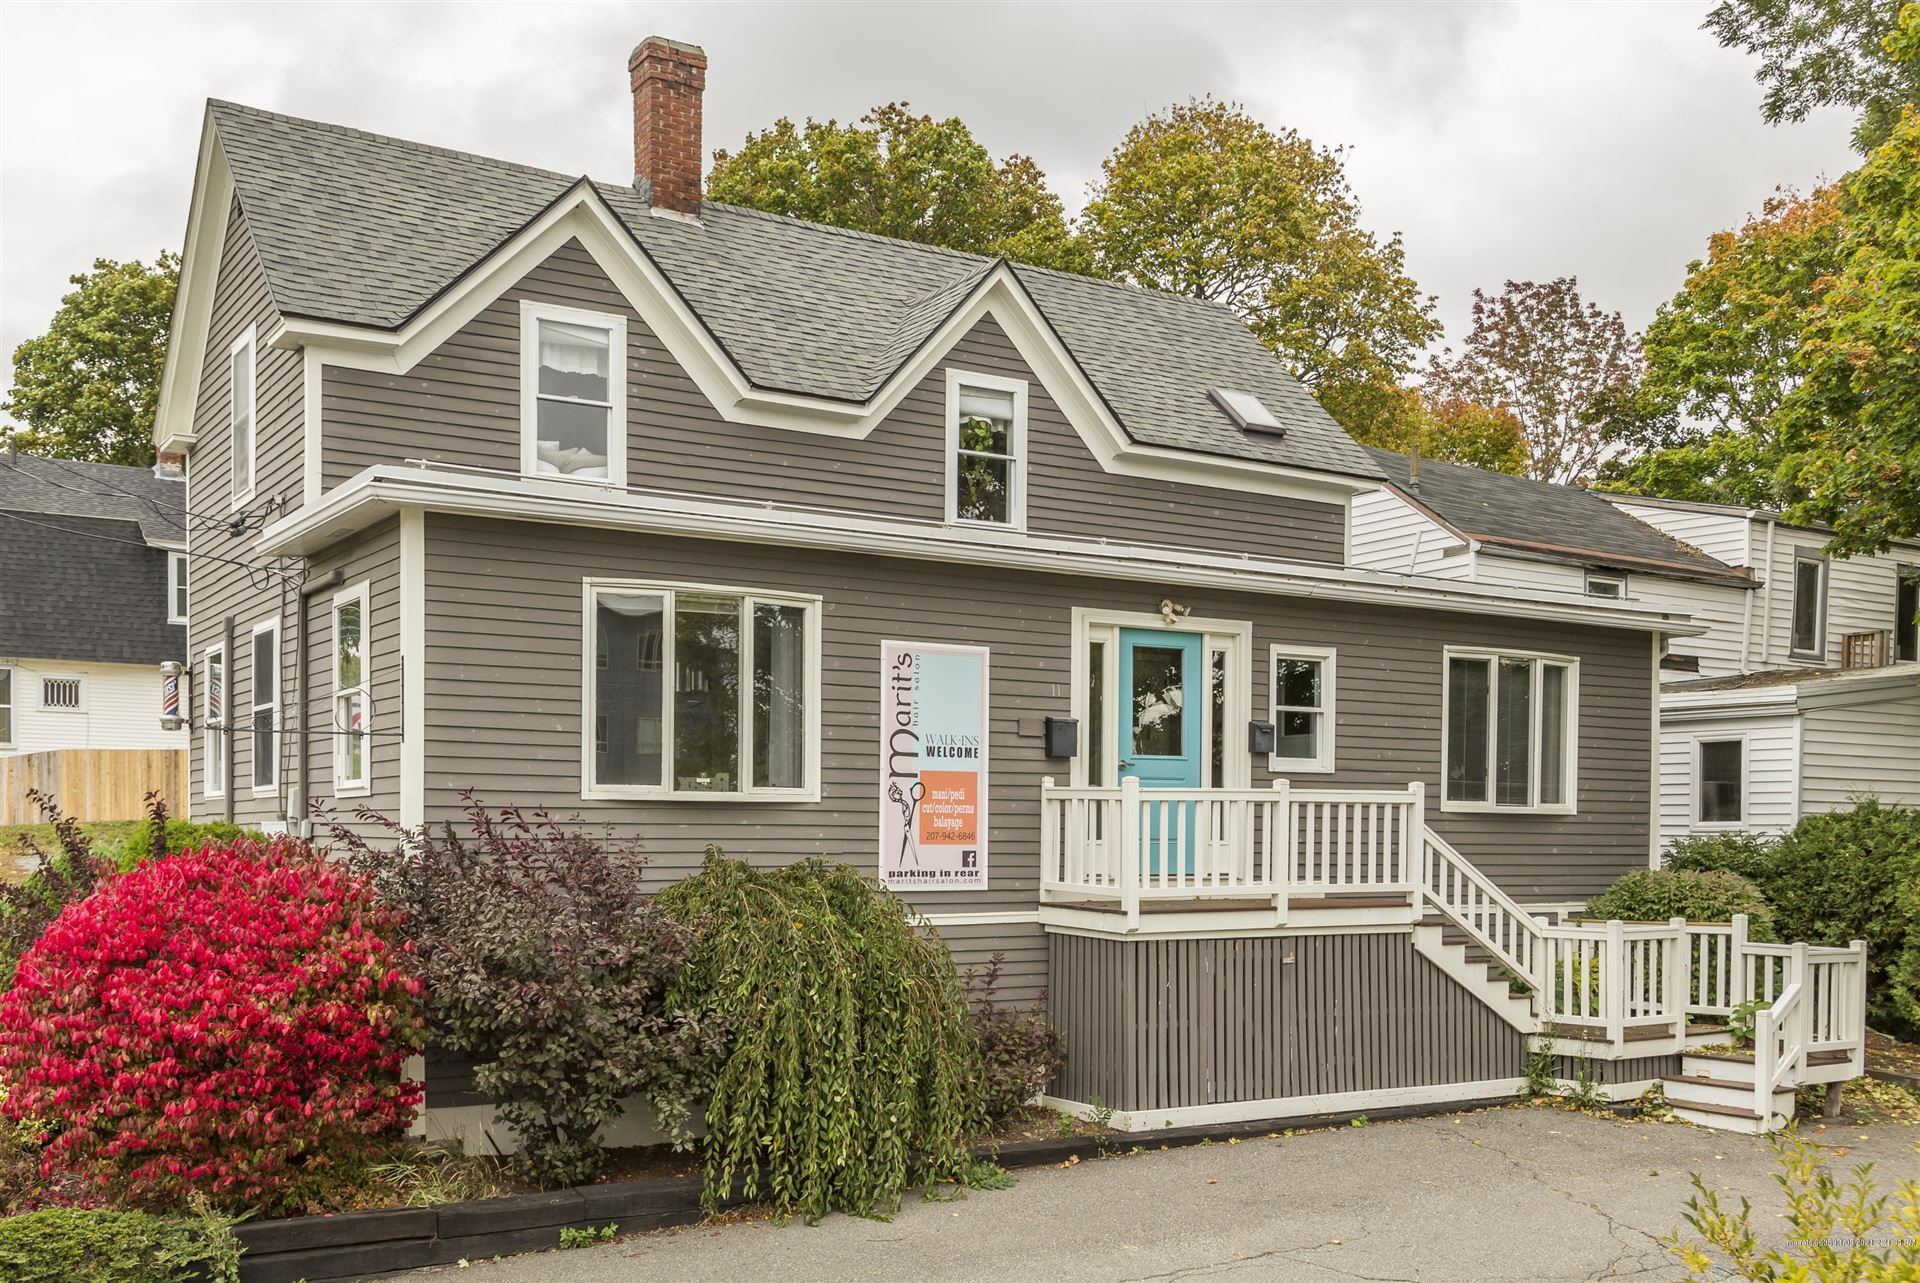 Photo of 11 Cumberland Street, Bangor, ME 04401 (MLS # 1479094)